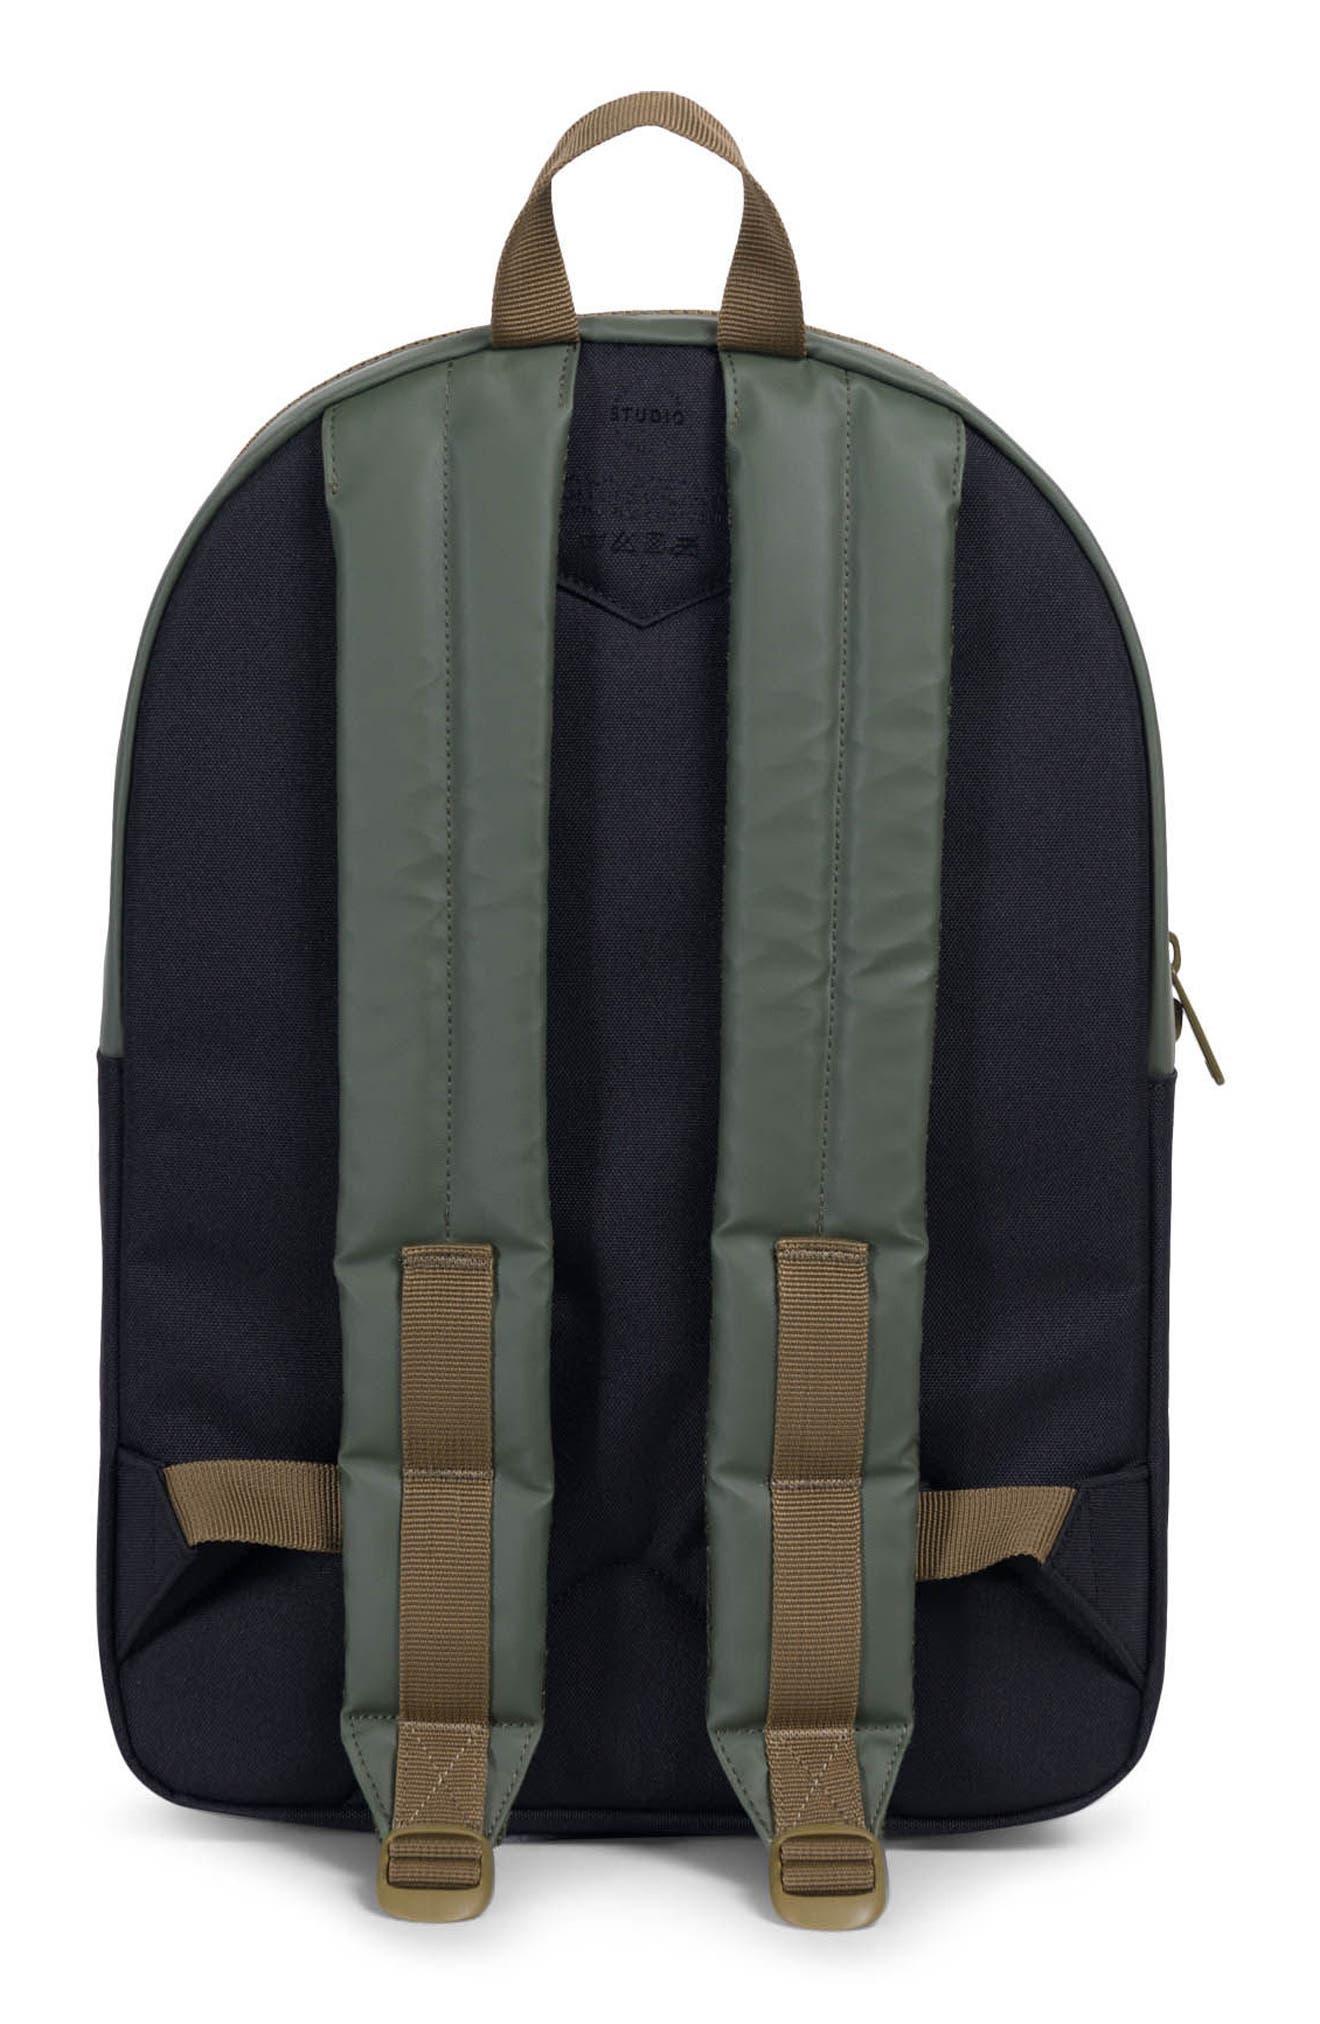 Winlaw Studio Backpack,                             Alternate thumbnail 2, color,                             Beetle Black/ Goth Olive